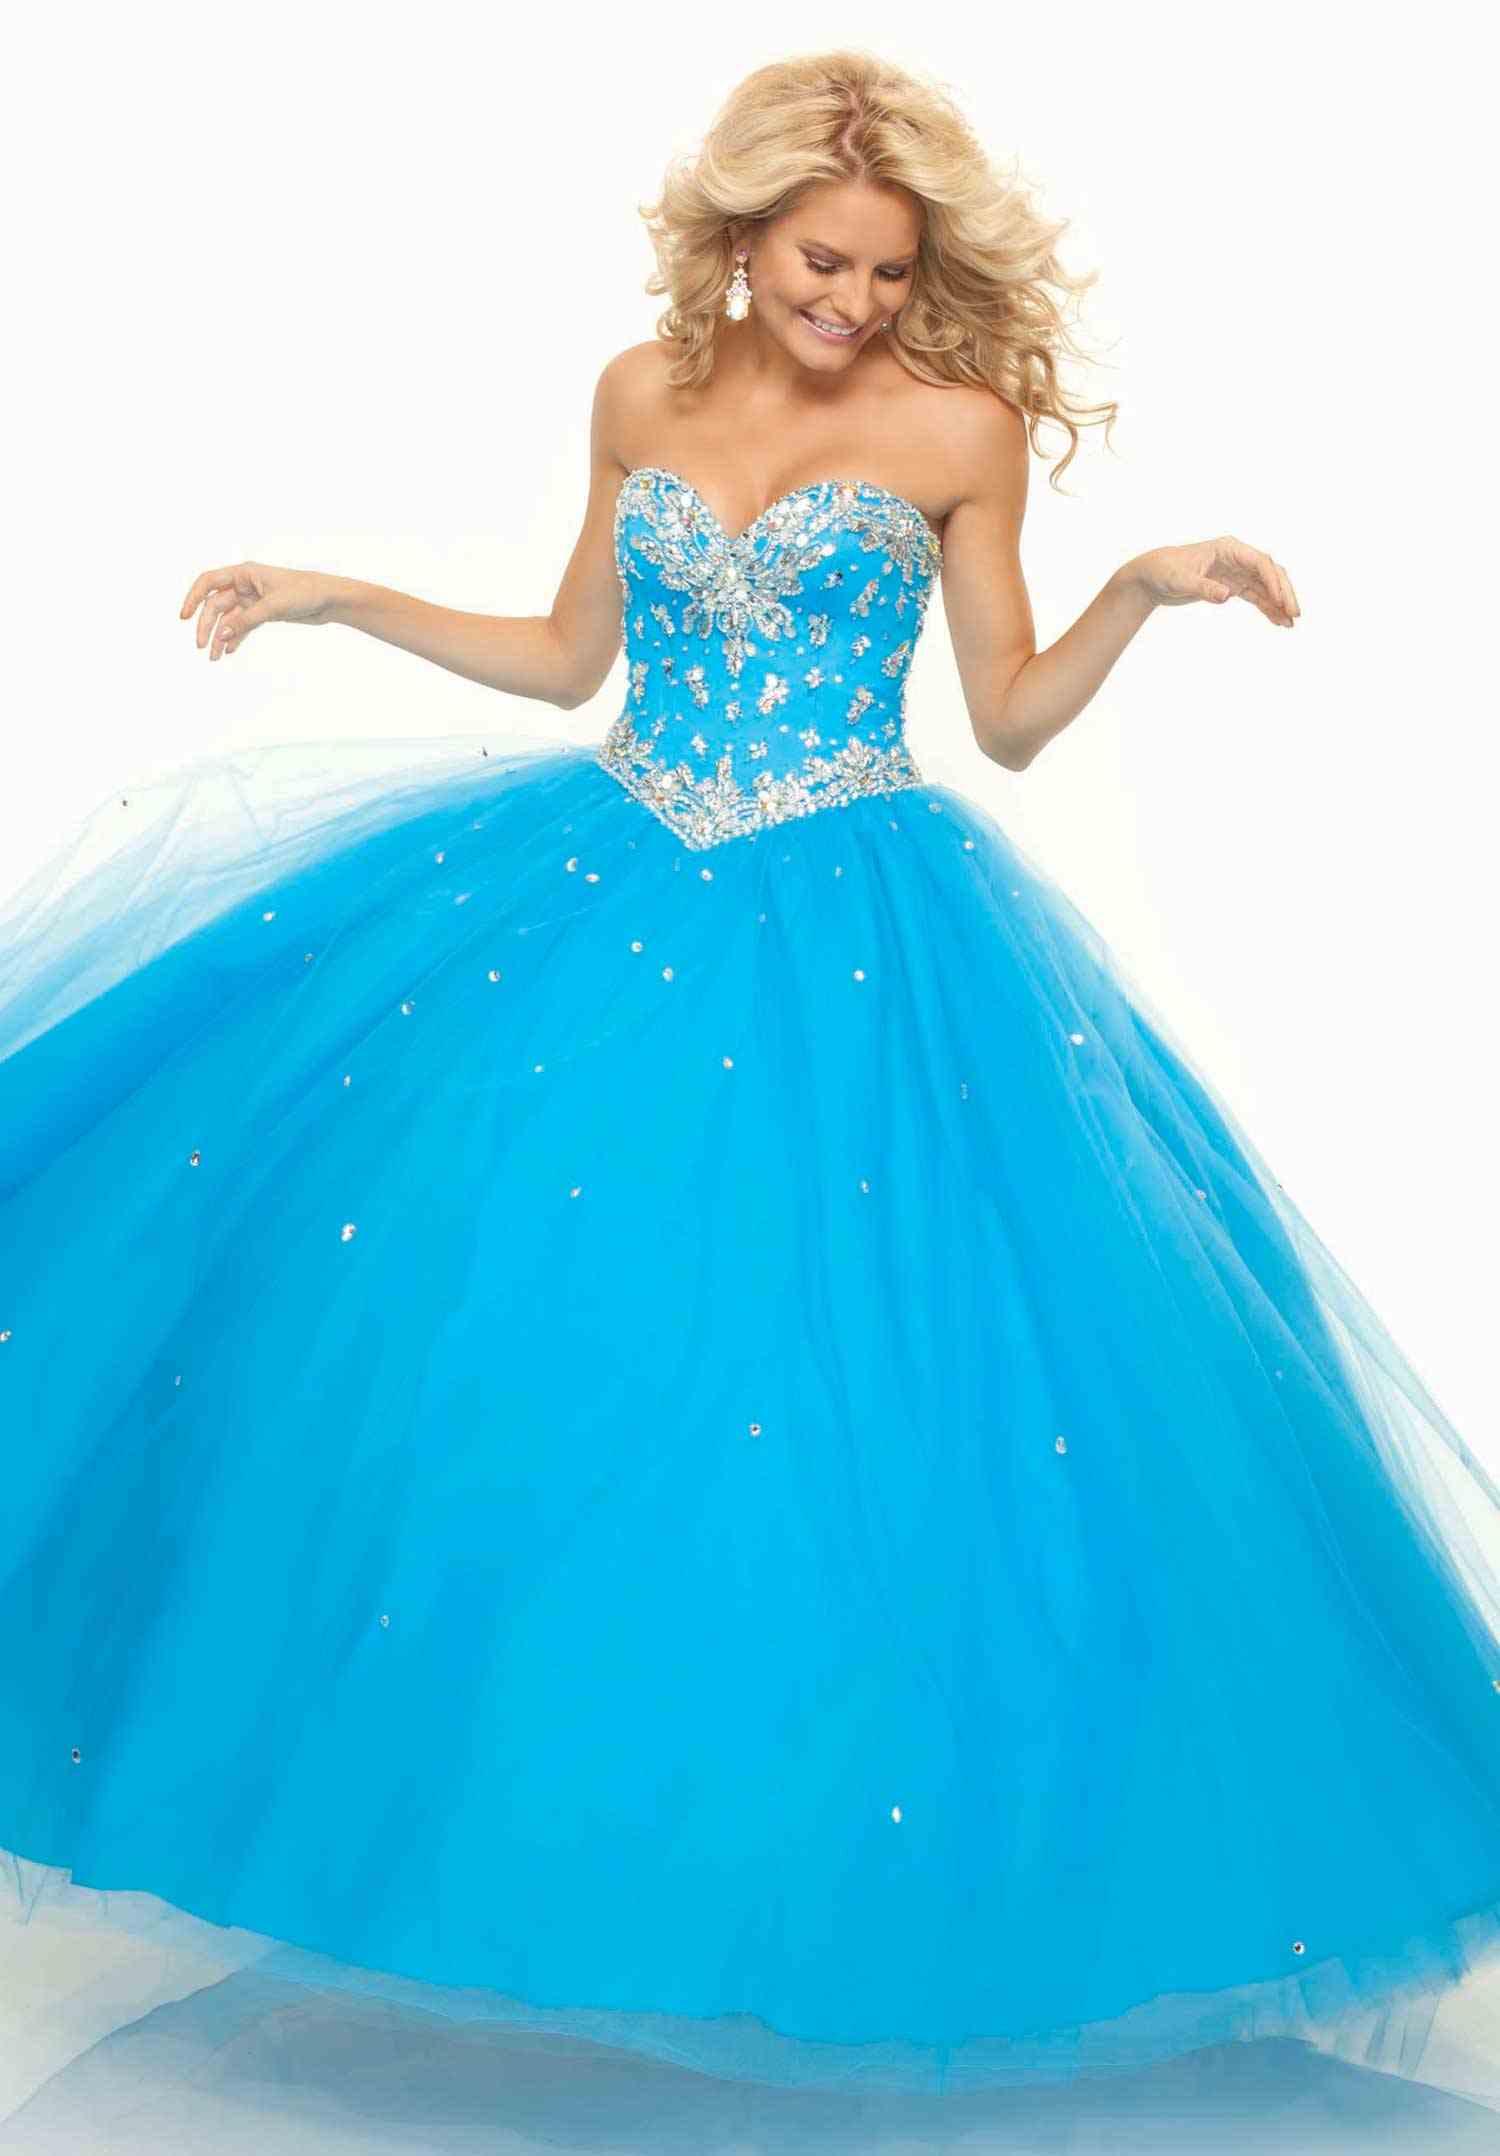 Cinderella Prom Dresses Debs_Prom Dresses_dressesss